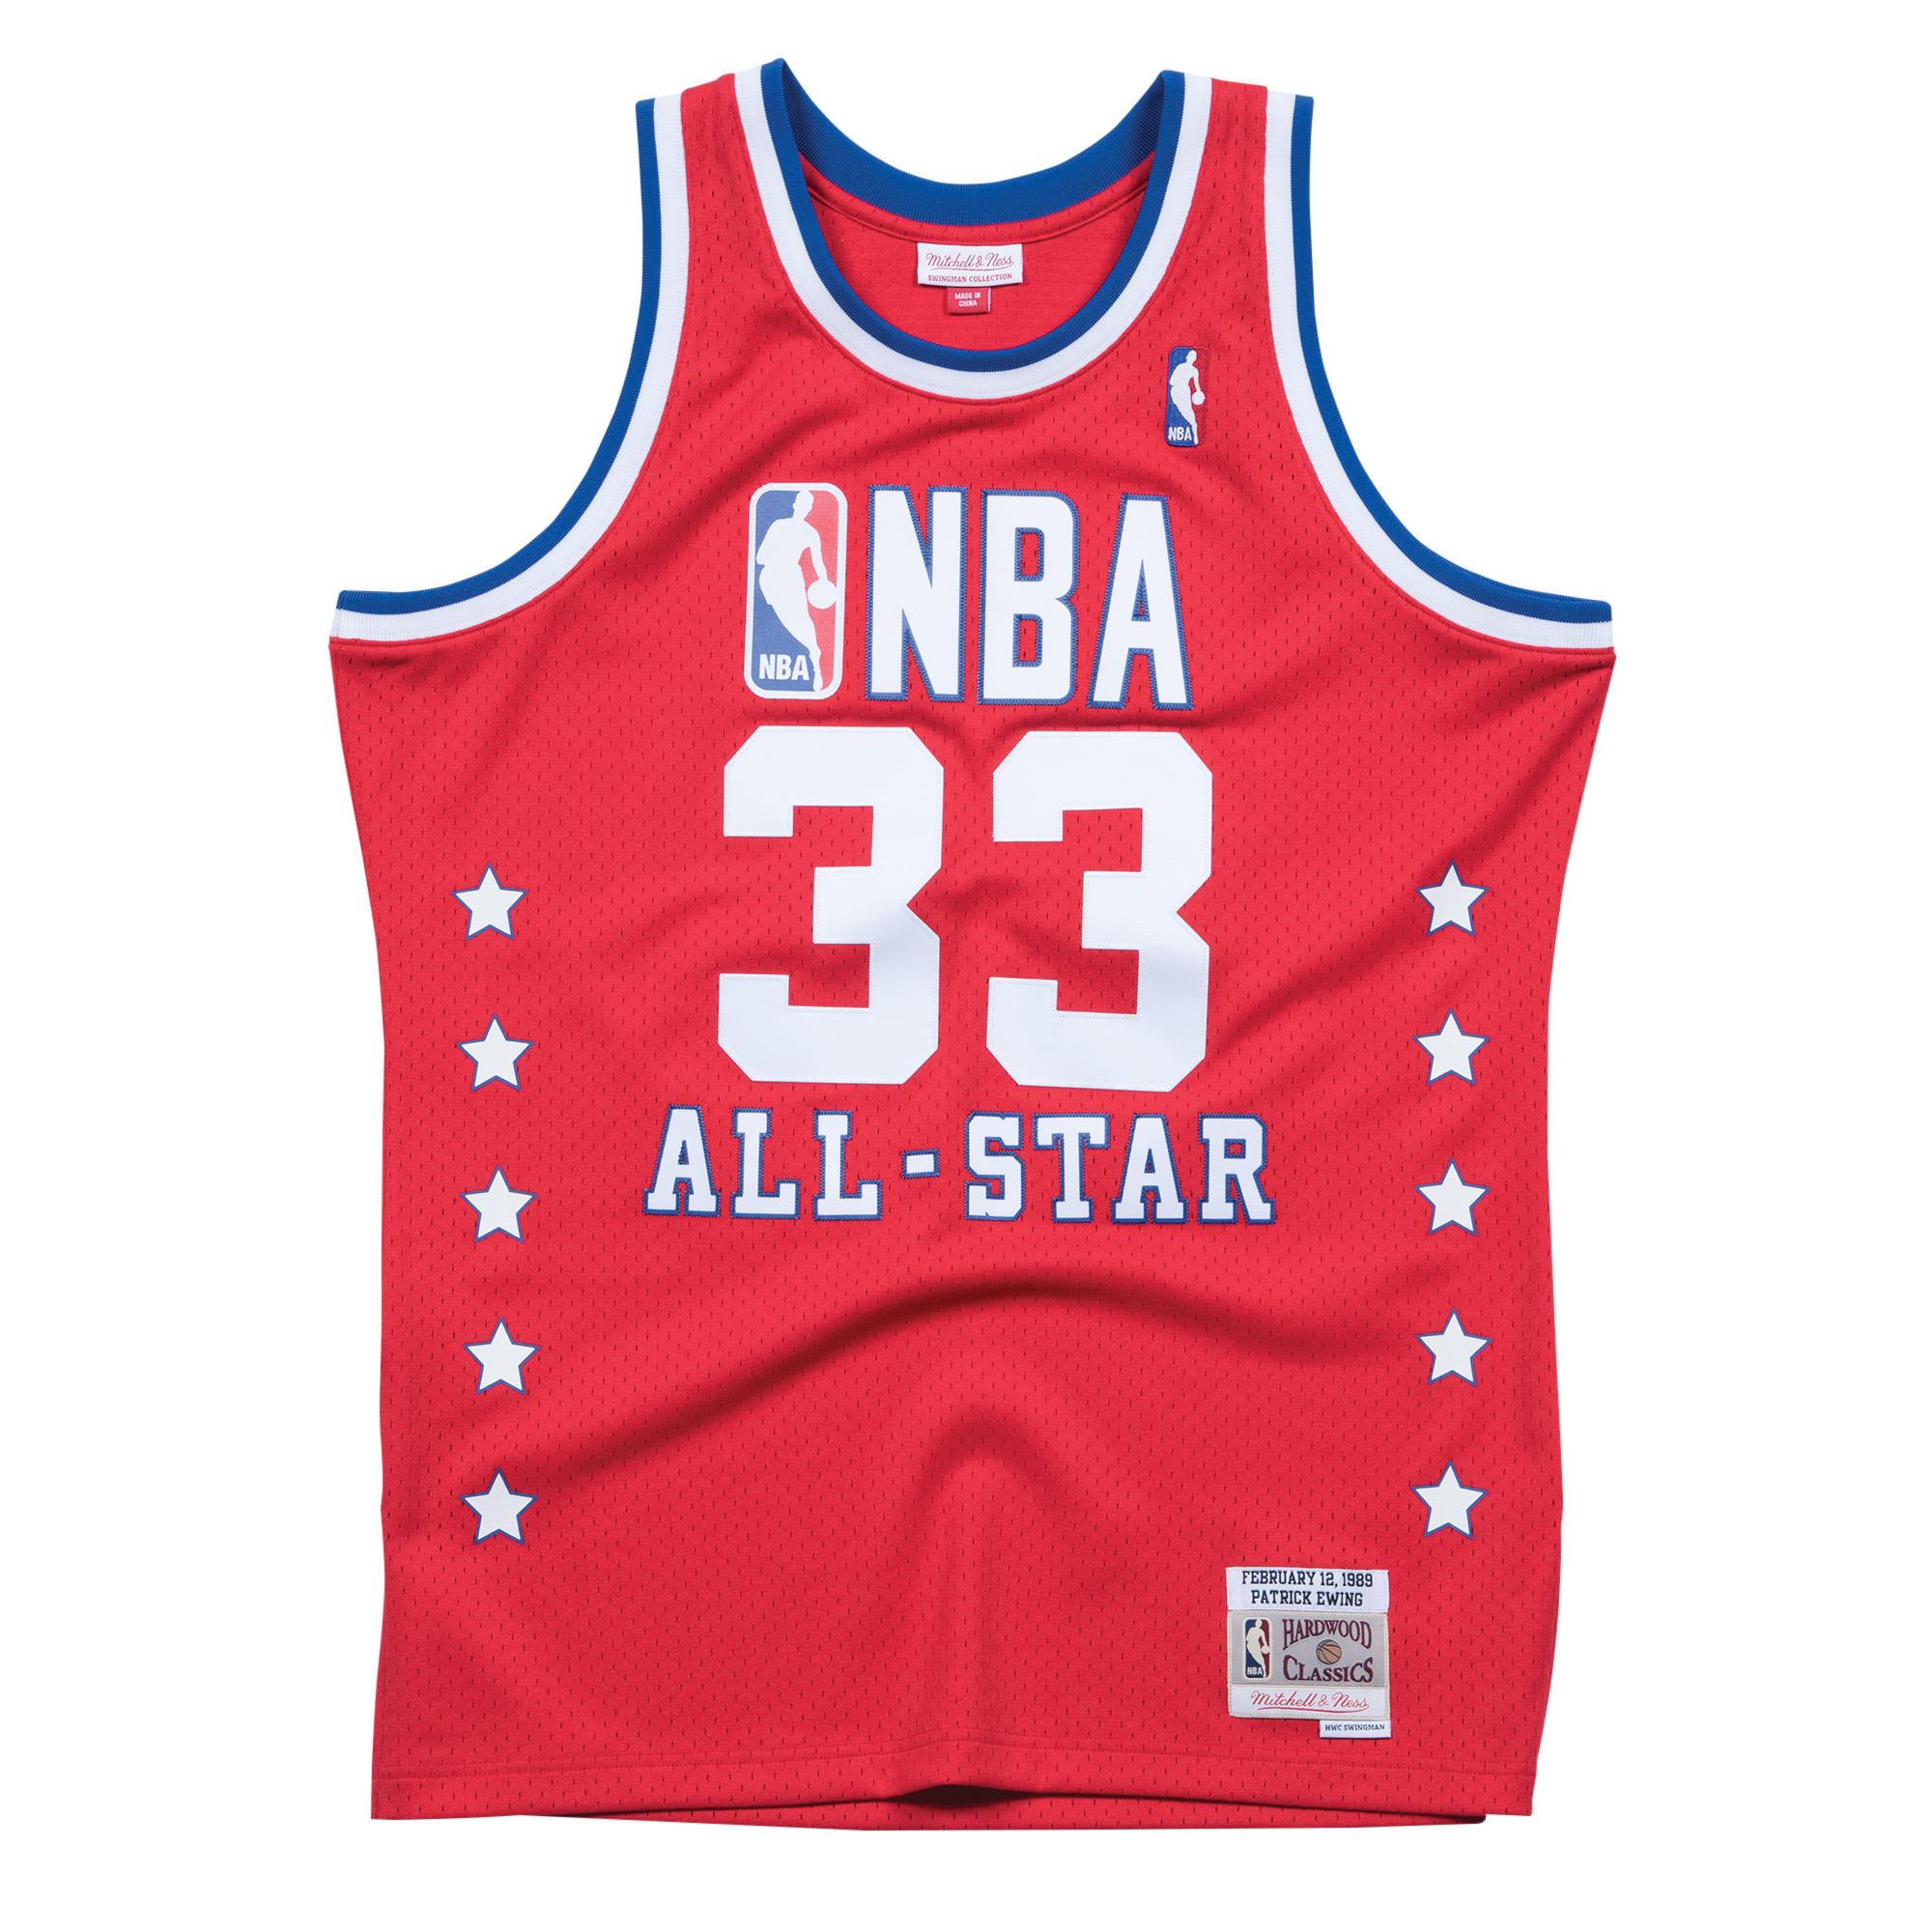 b0033a478 Patrick Ewing 1989 East Swingman Jersey NBA All-Star